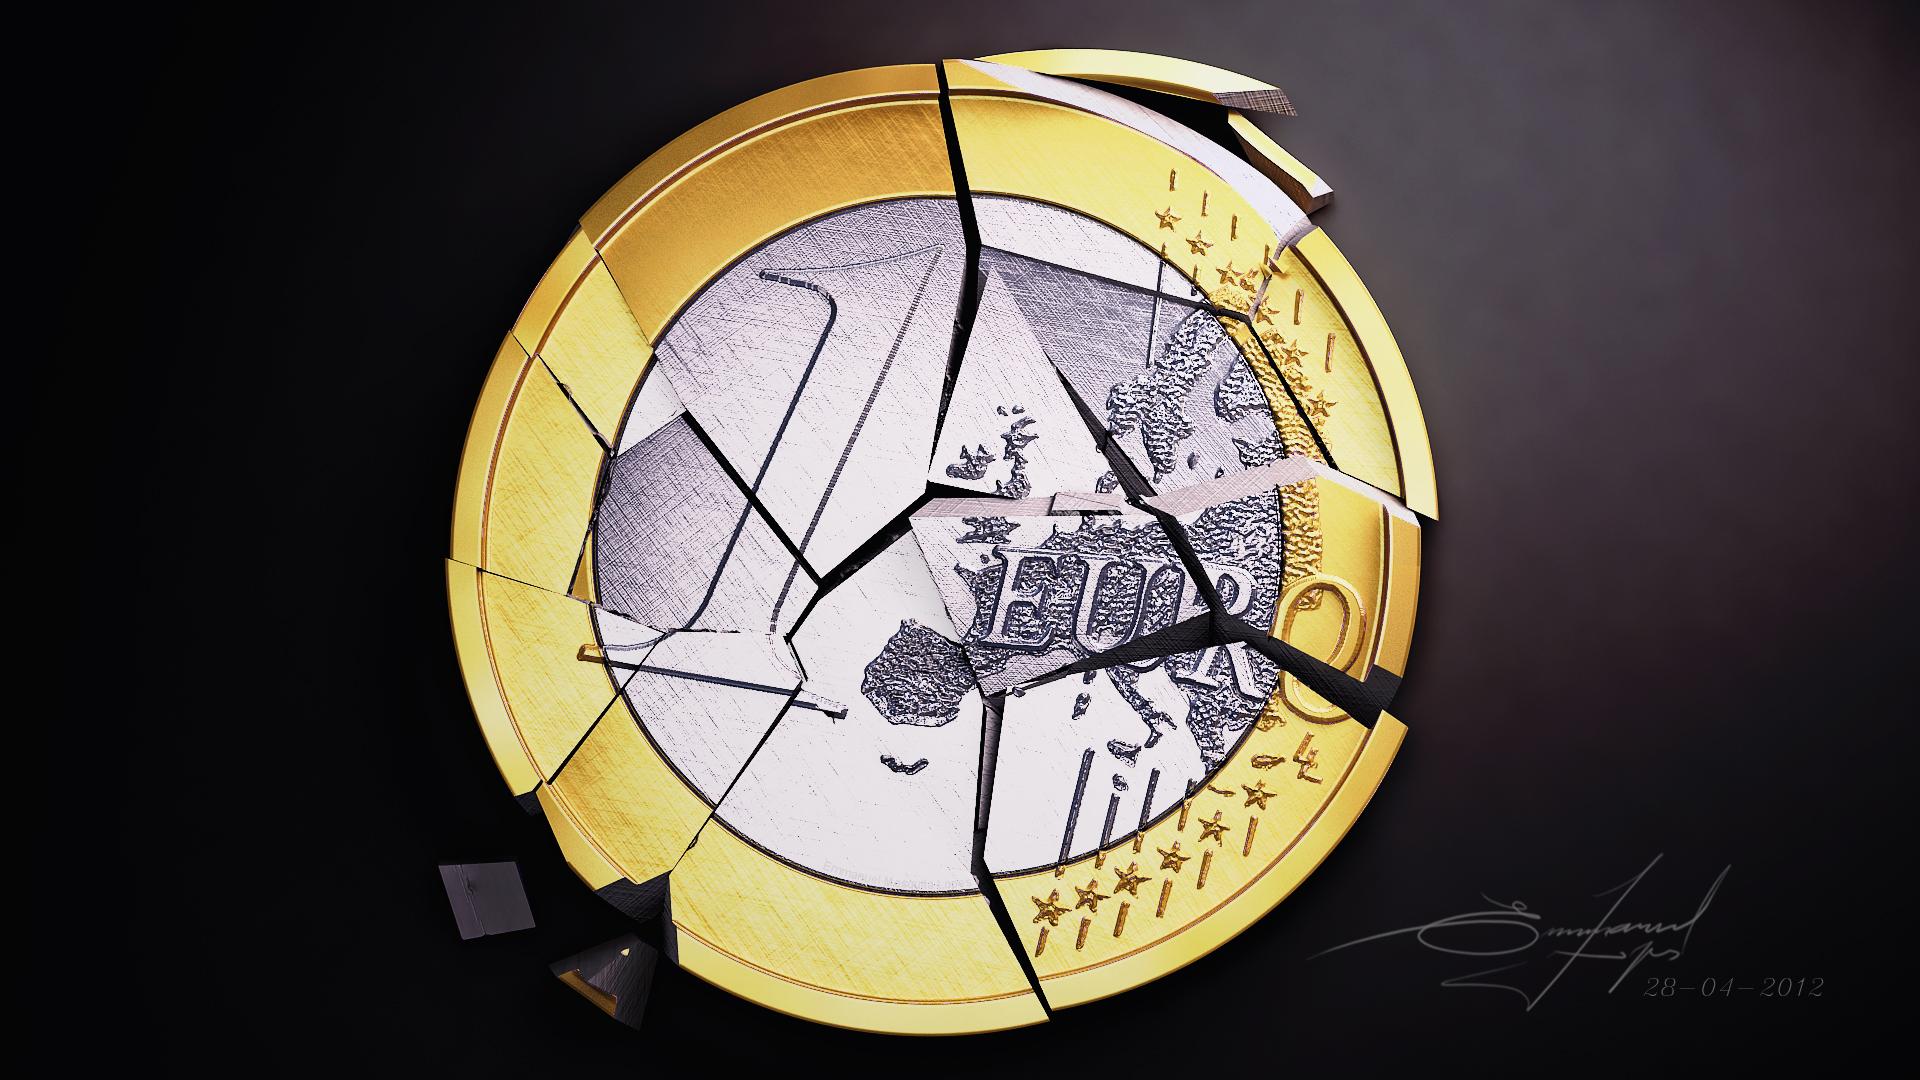 http://icebergfinanza.finanza.com/files/2013/10/euro-crash.jpg